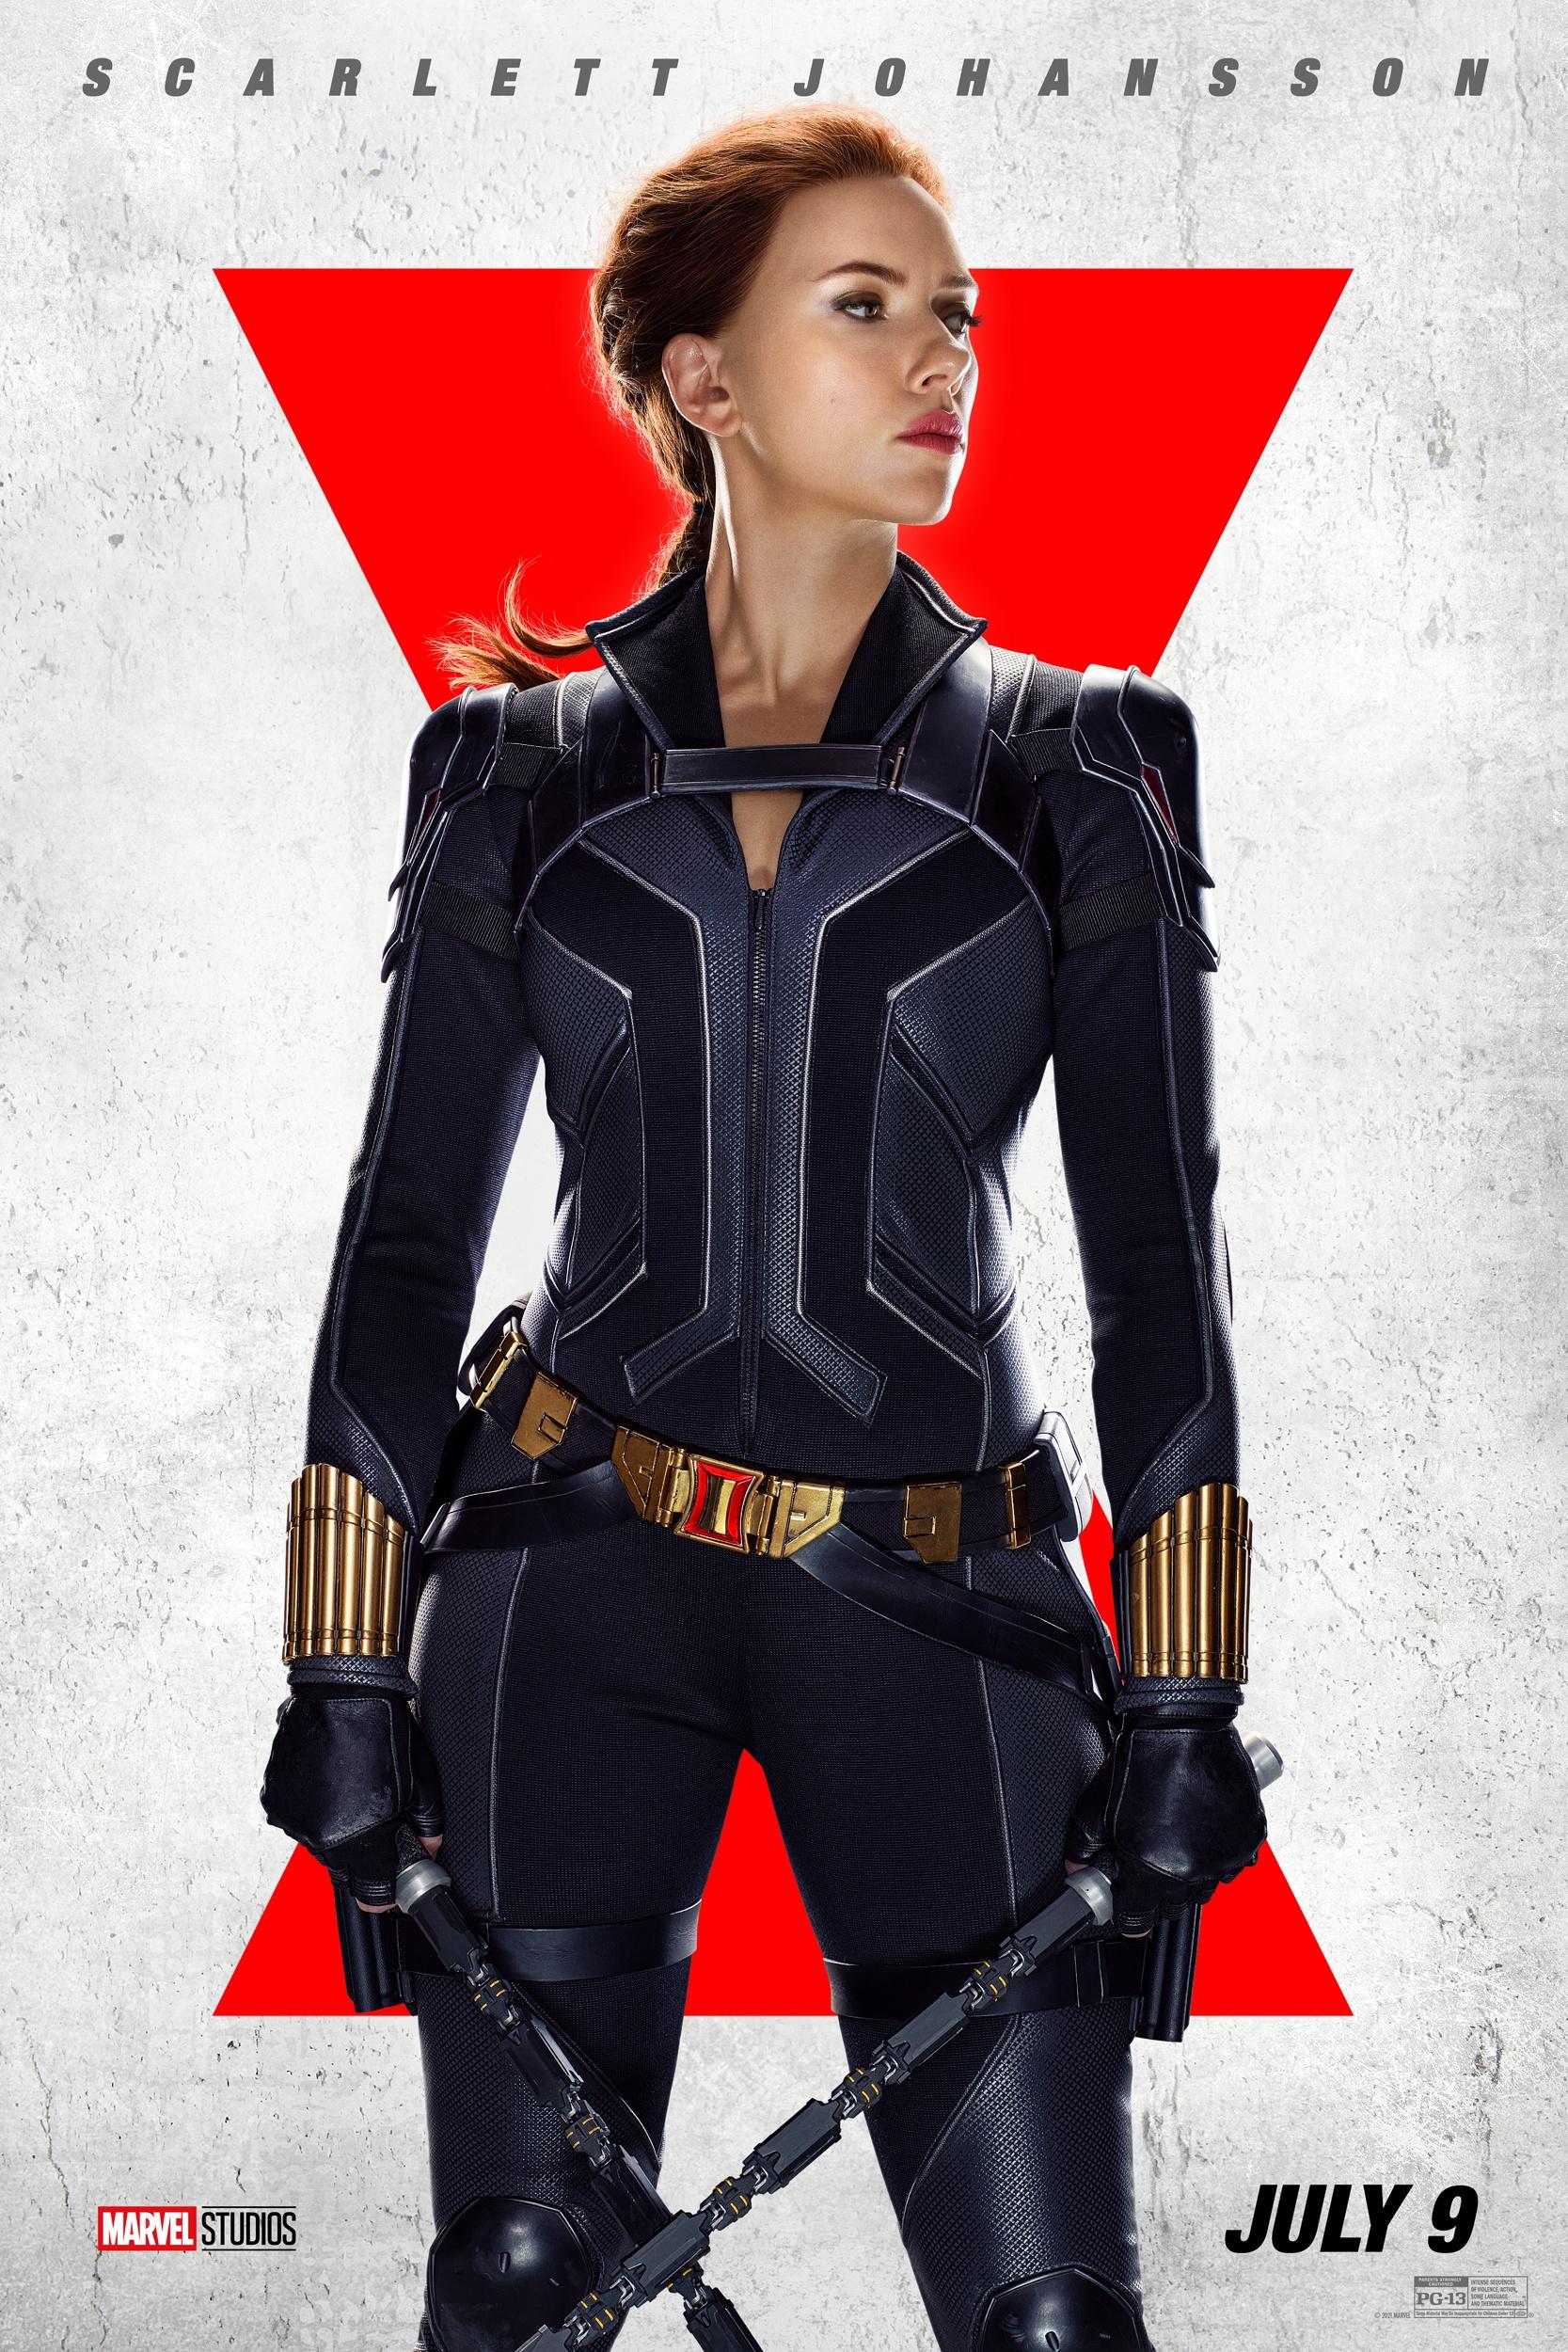 Pinky Review: Marvel Studios 'Black Widow' Starring Scarlett Johansson